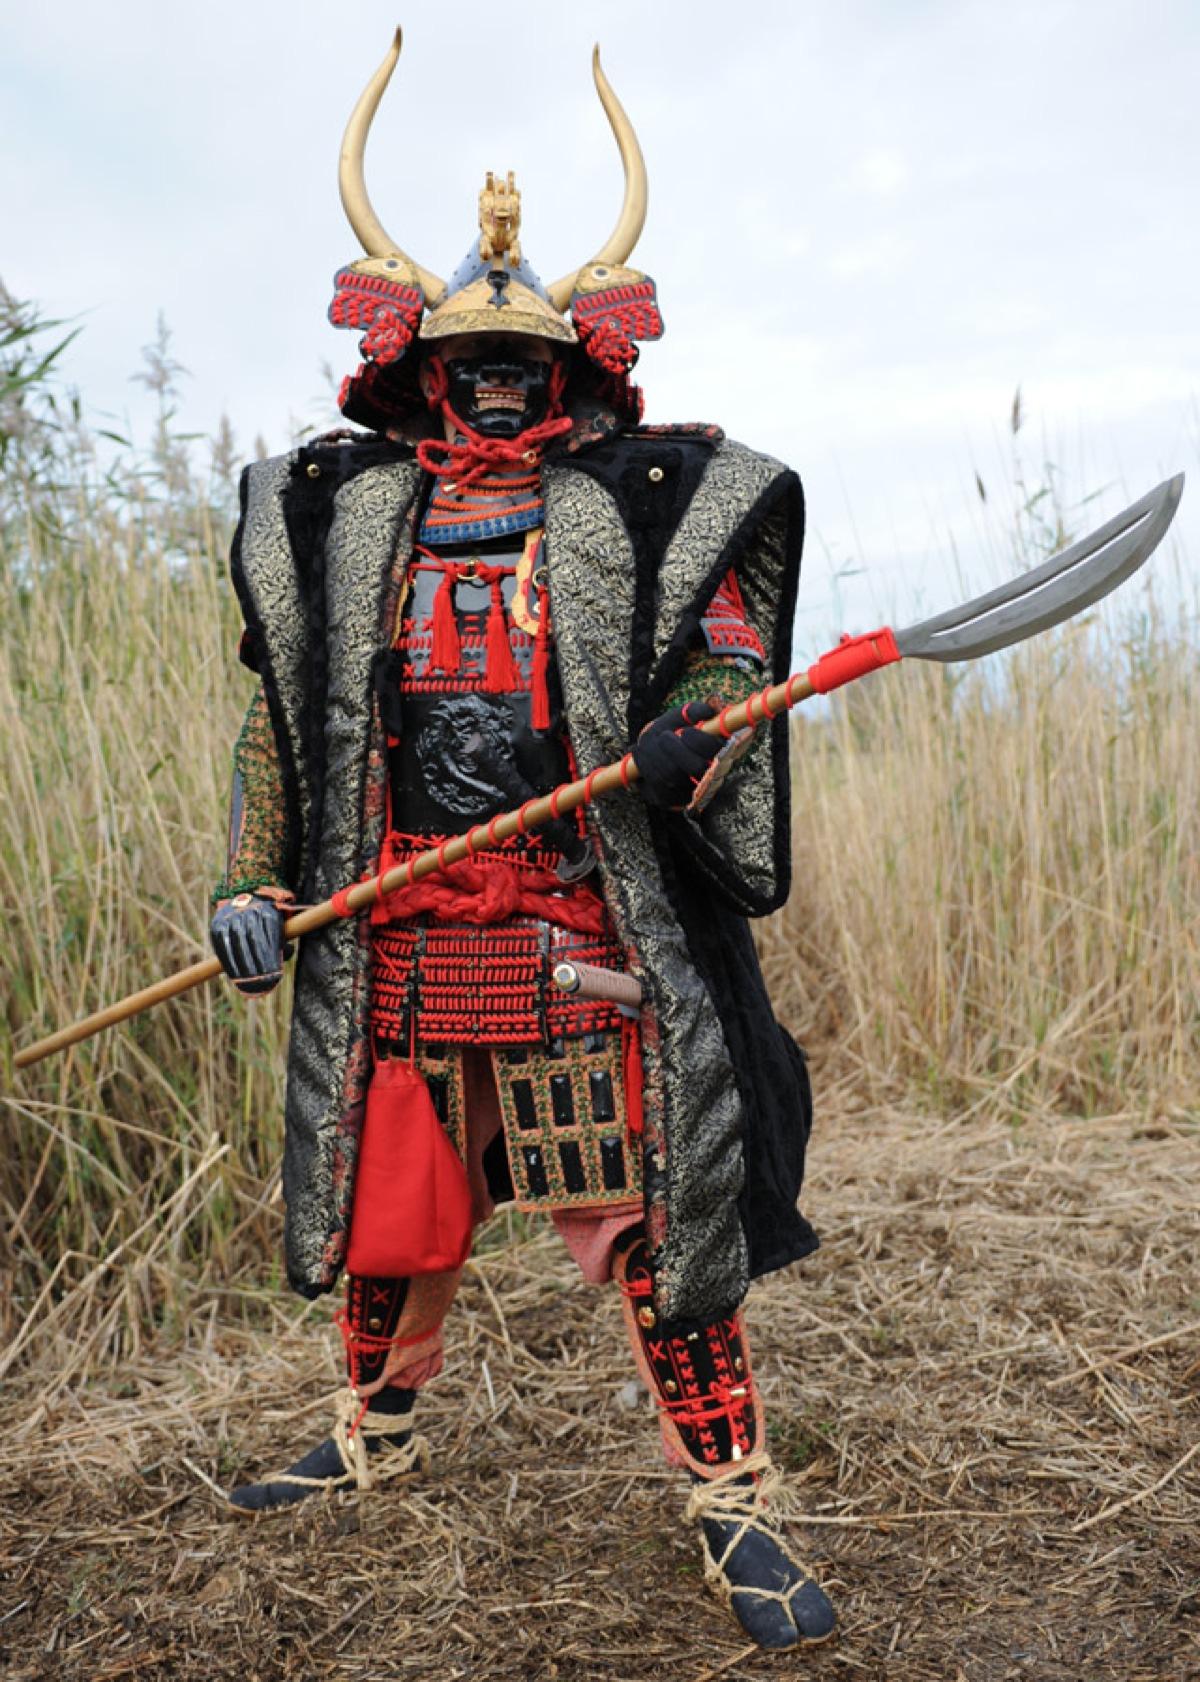 The Golden Dragon The Last Daimyo Seeking Samurai